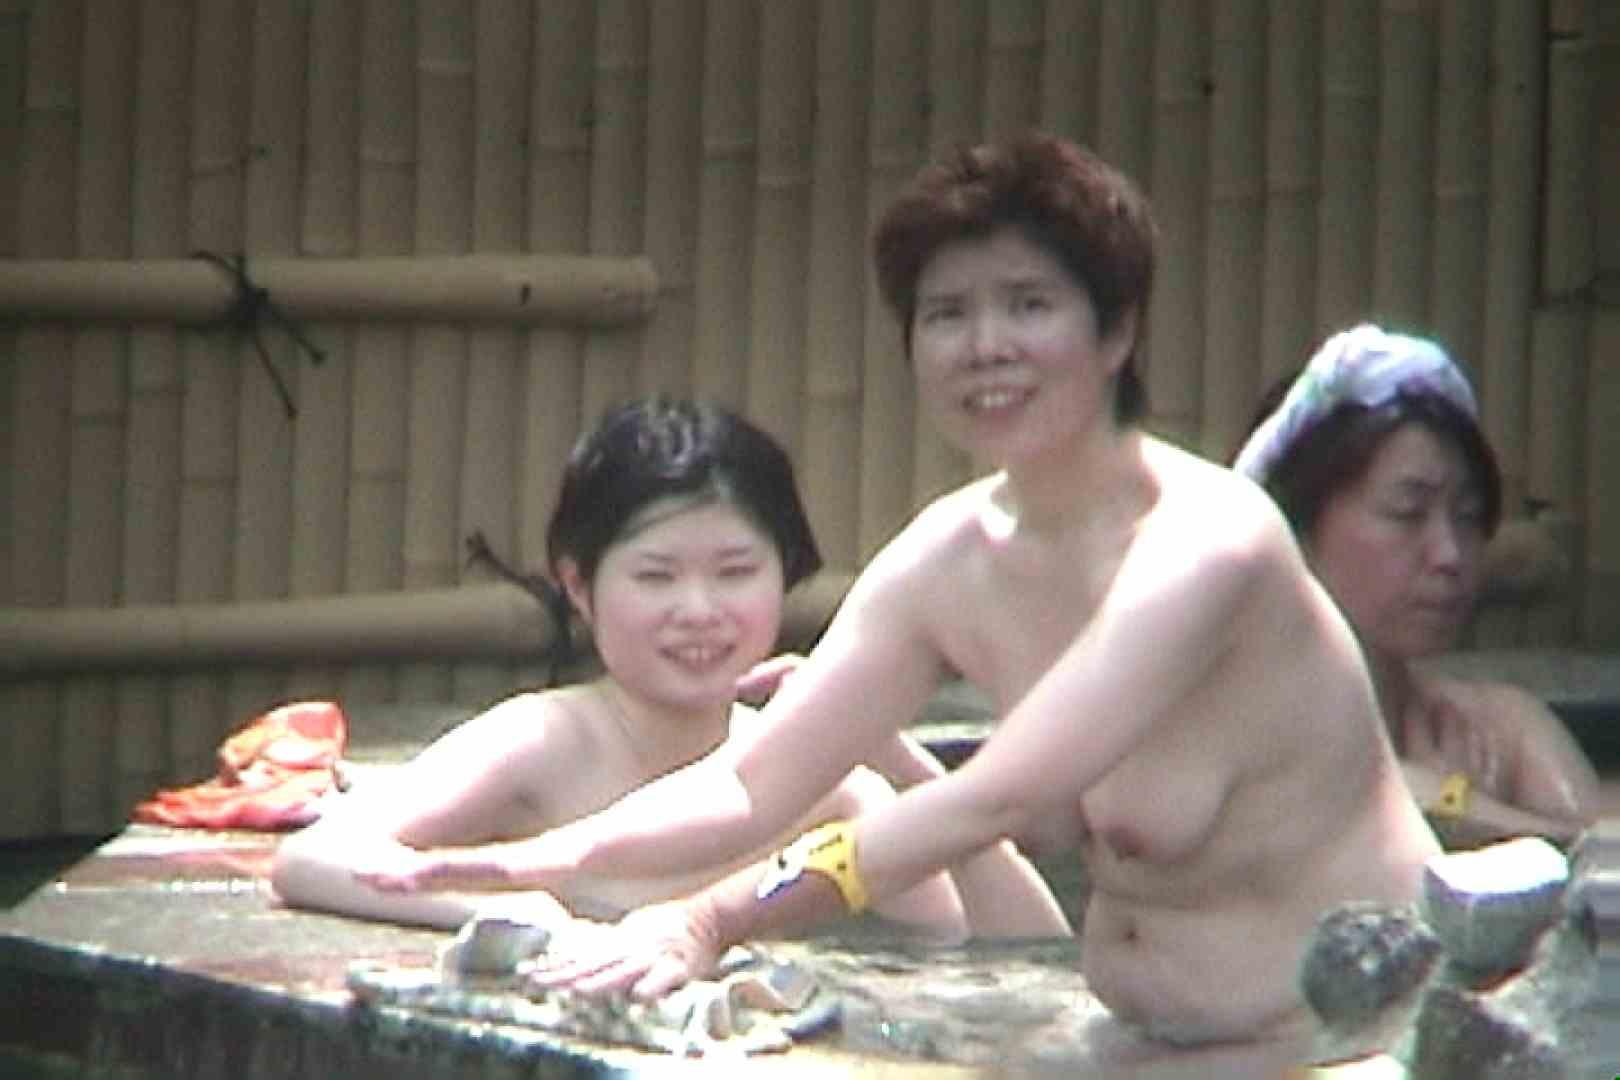 Aquaな露天風呂Vol.54【VIP限定】 露天風呂突入 | 美しいOLの裸体  88pic 40